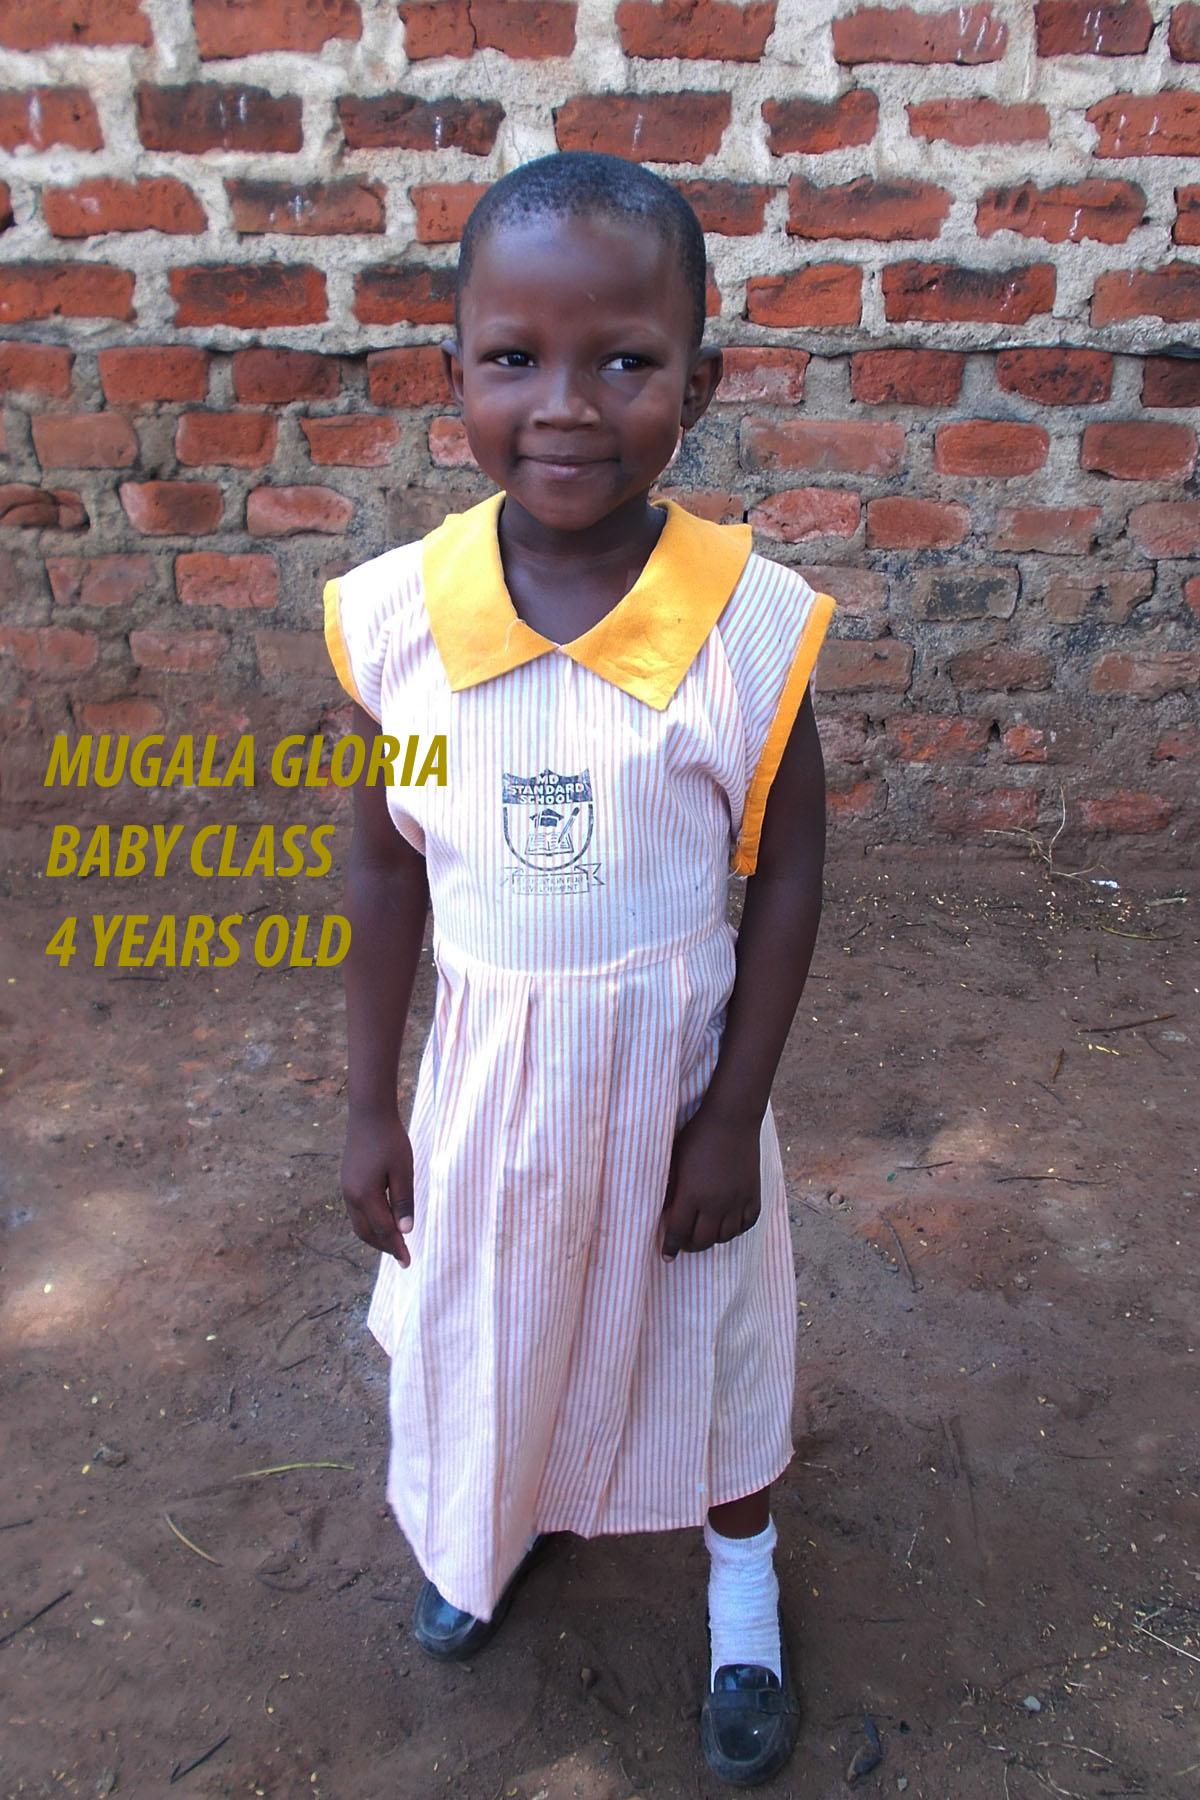 Gloria Mugala